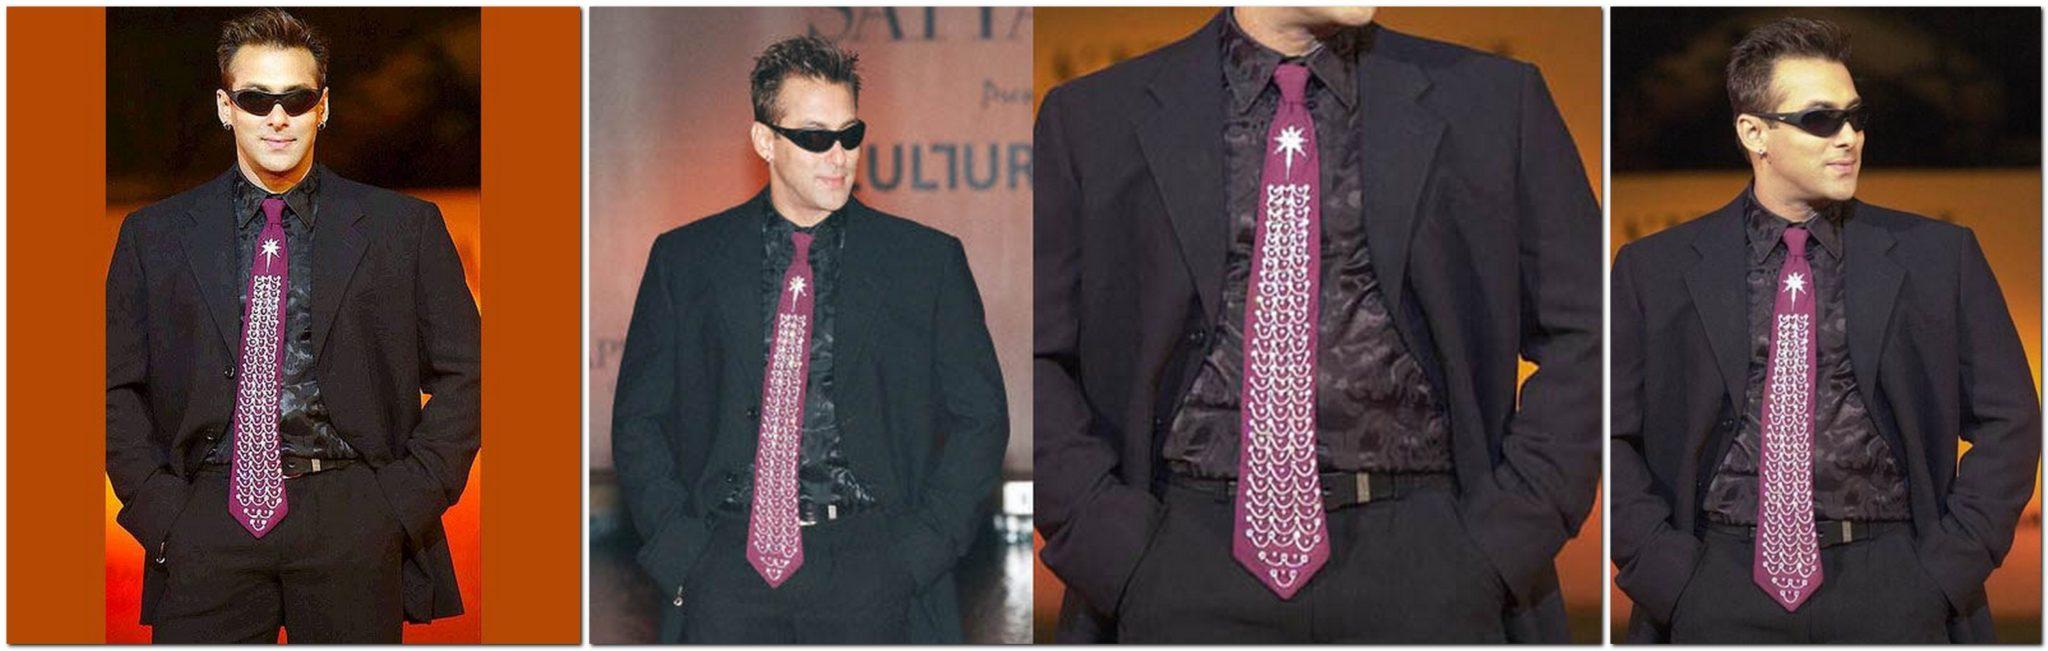 """Suashish Tie"" by Satya Paul design studio"